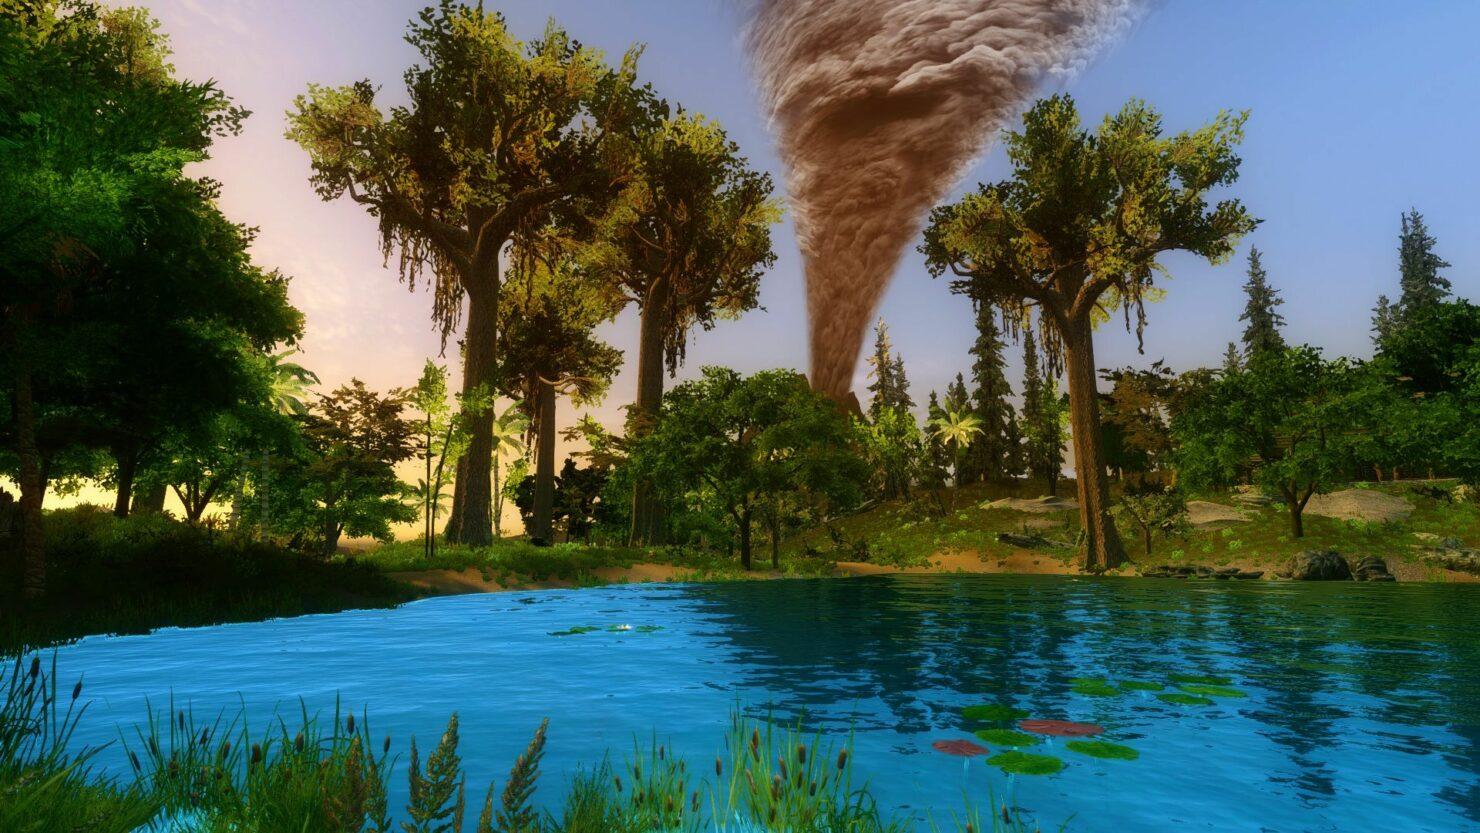 elder-scrolls-v-skyrim-legendary-edition-project-rainforest-mod-update-8